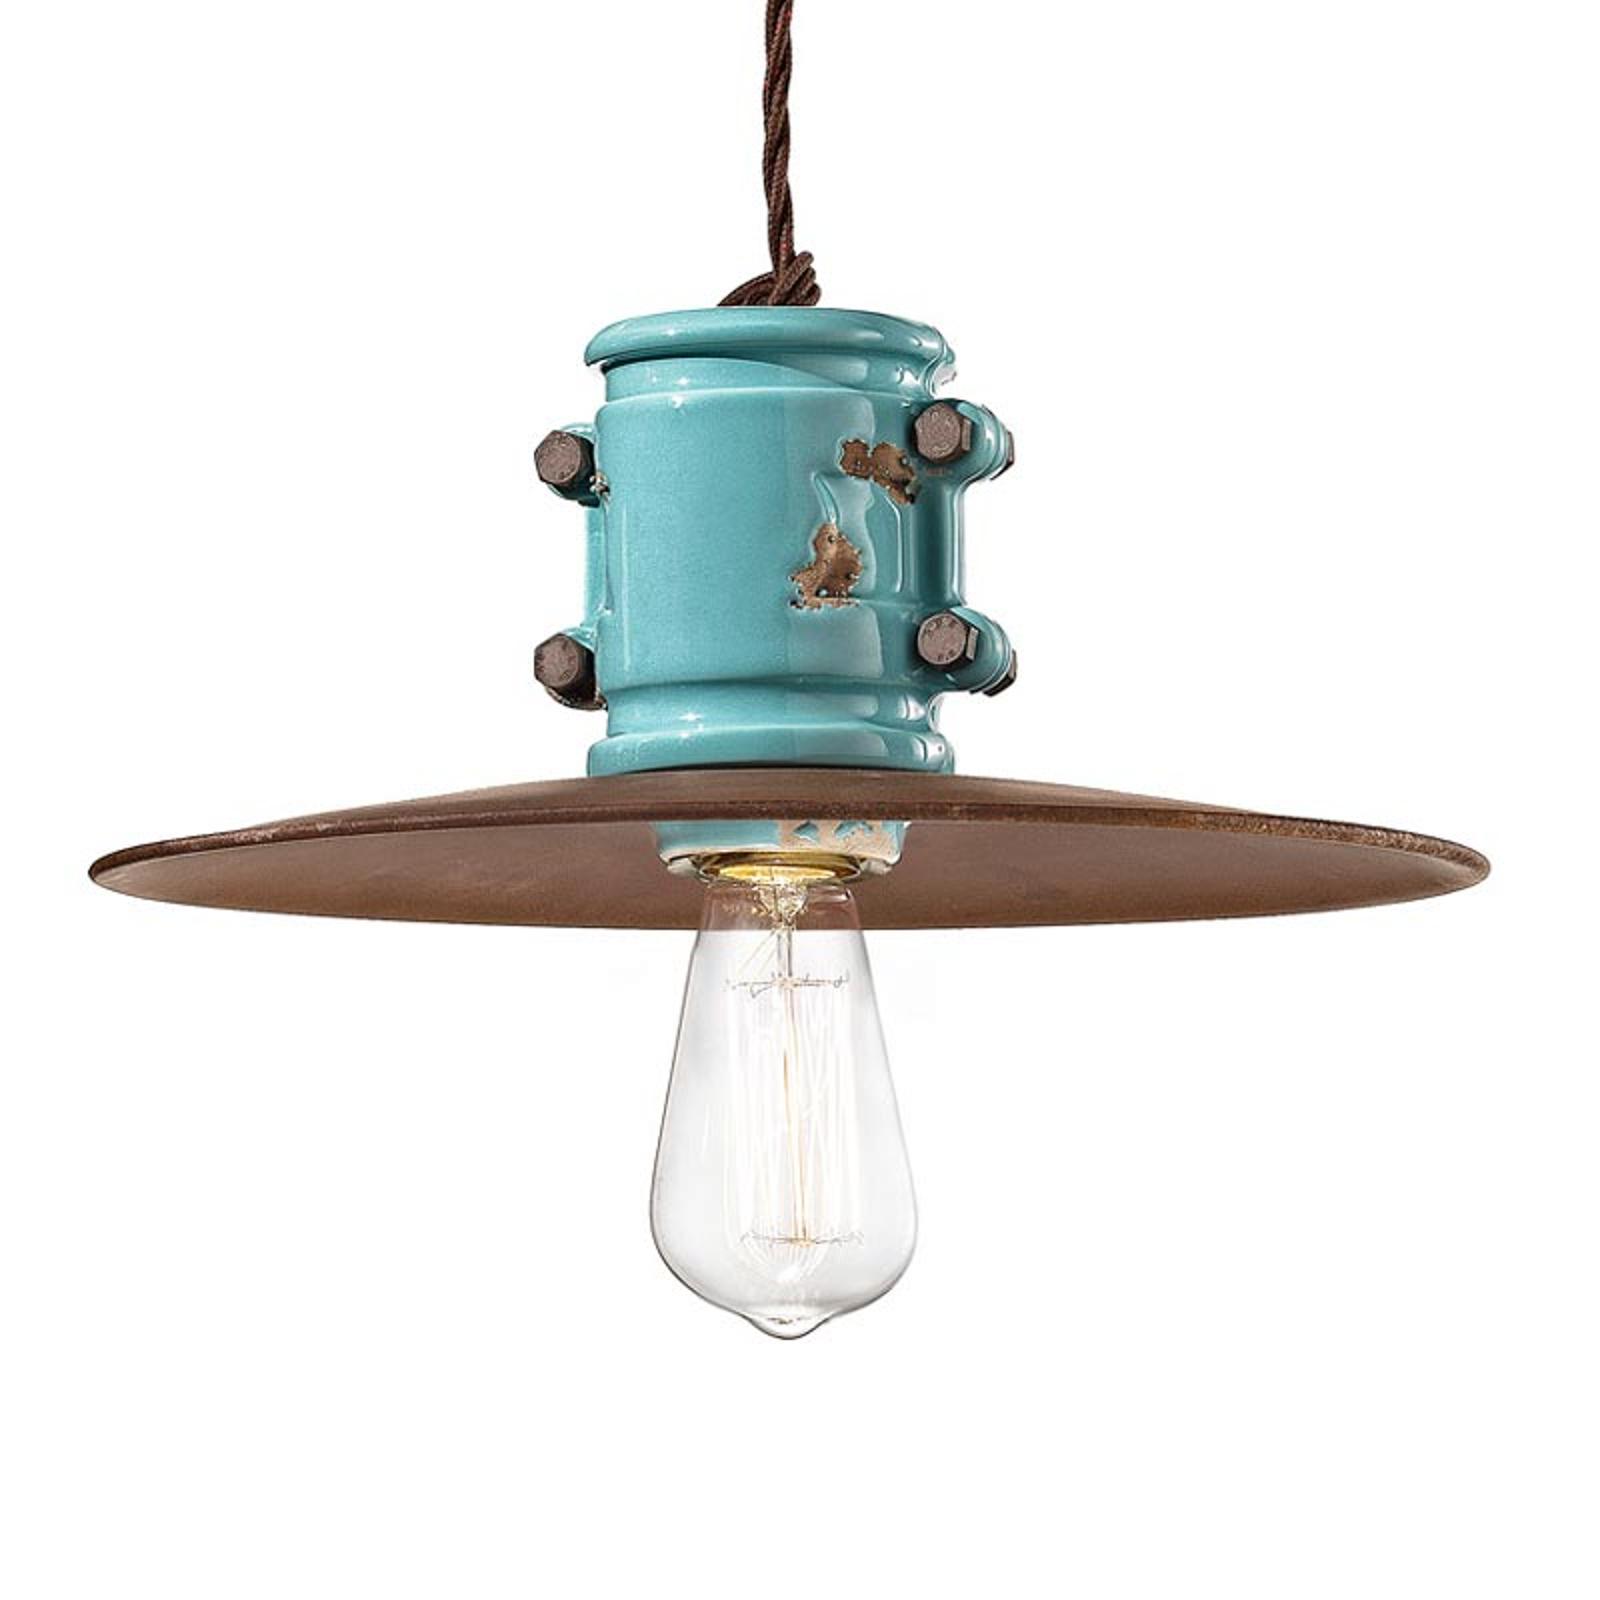 Vintage hanglamp Nicolo in turkoois